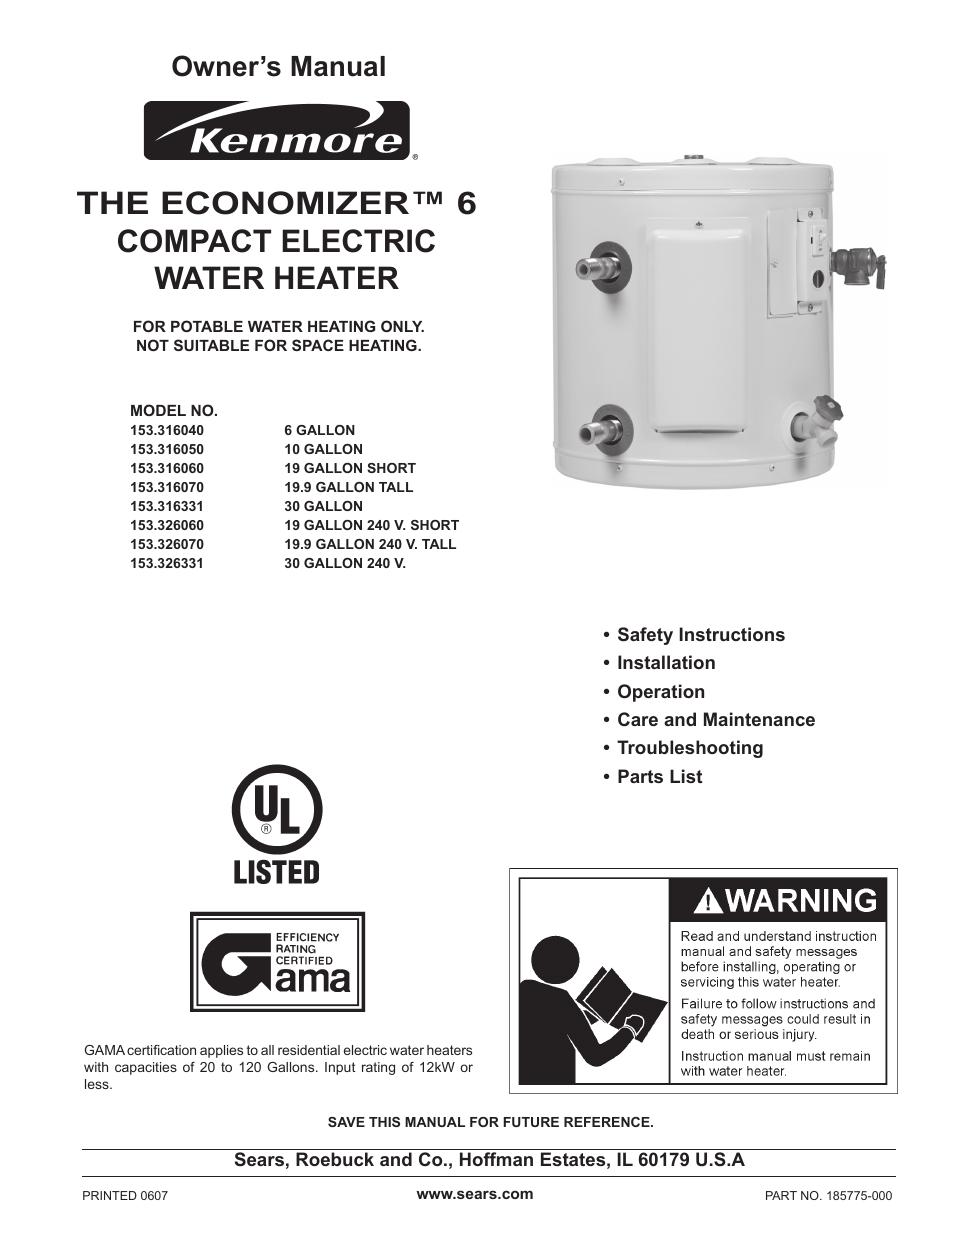 Kenmore Electric Water Heater Wiring Diagram : Sears electric water heater wiring diagram of